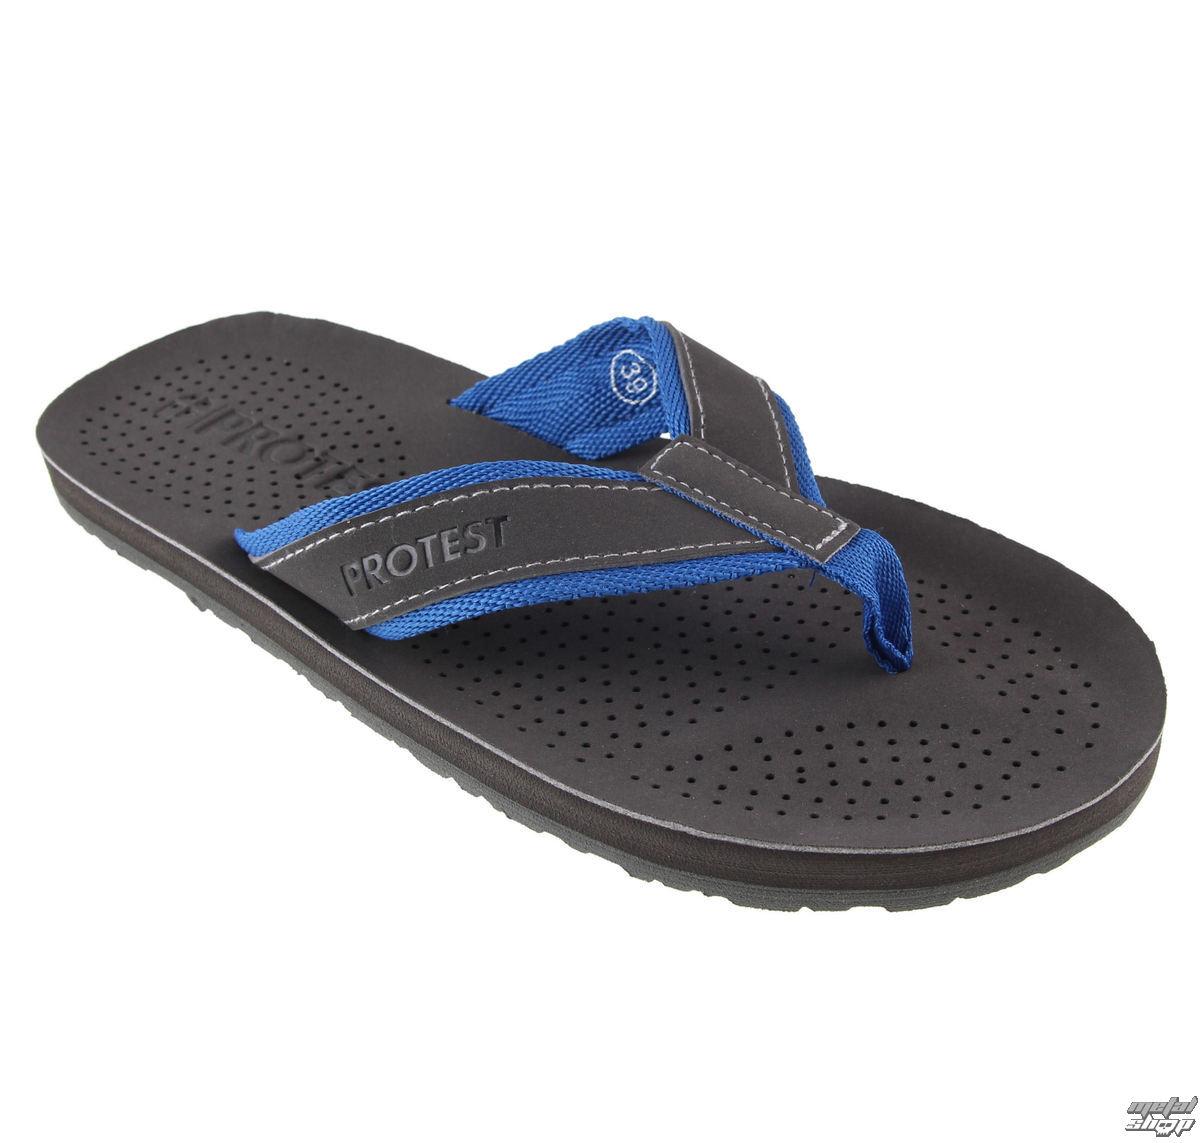 sandály pánské PROTEST - Spice - Asphalt - 5710200-897